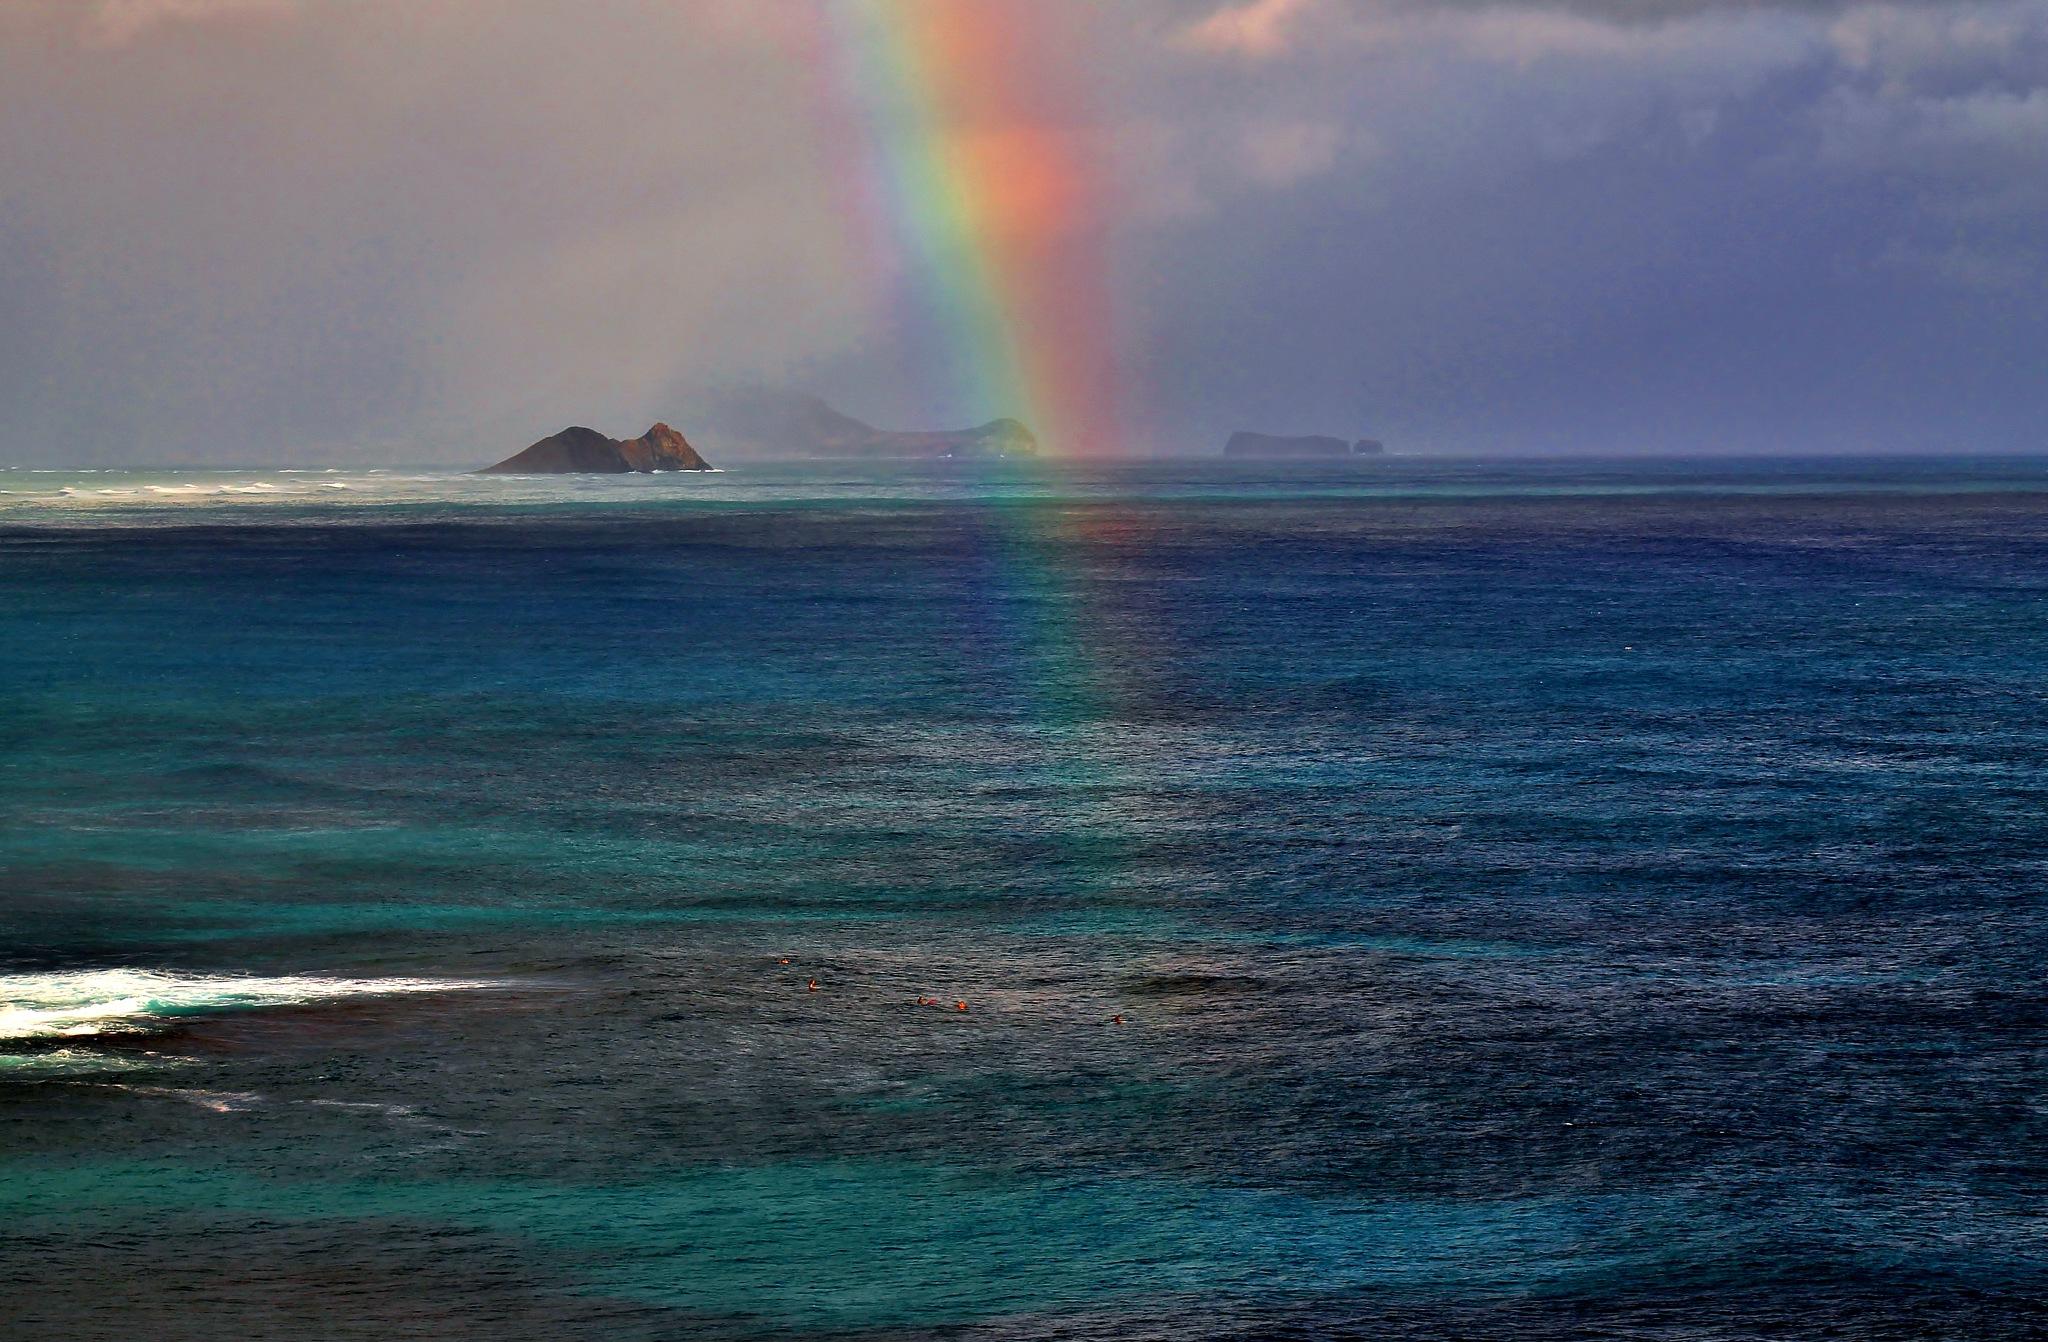 Rainbow in Paradise by yehaa_2001